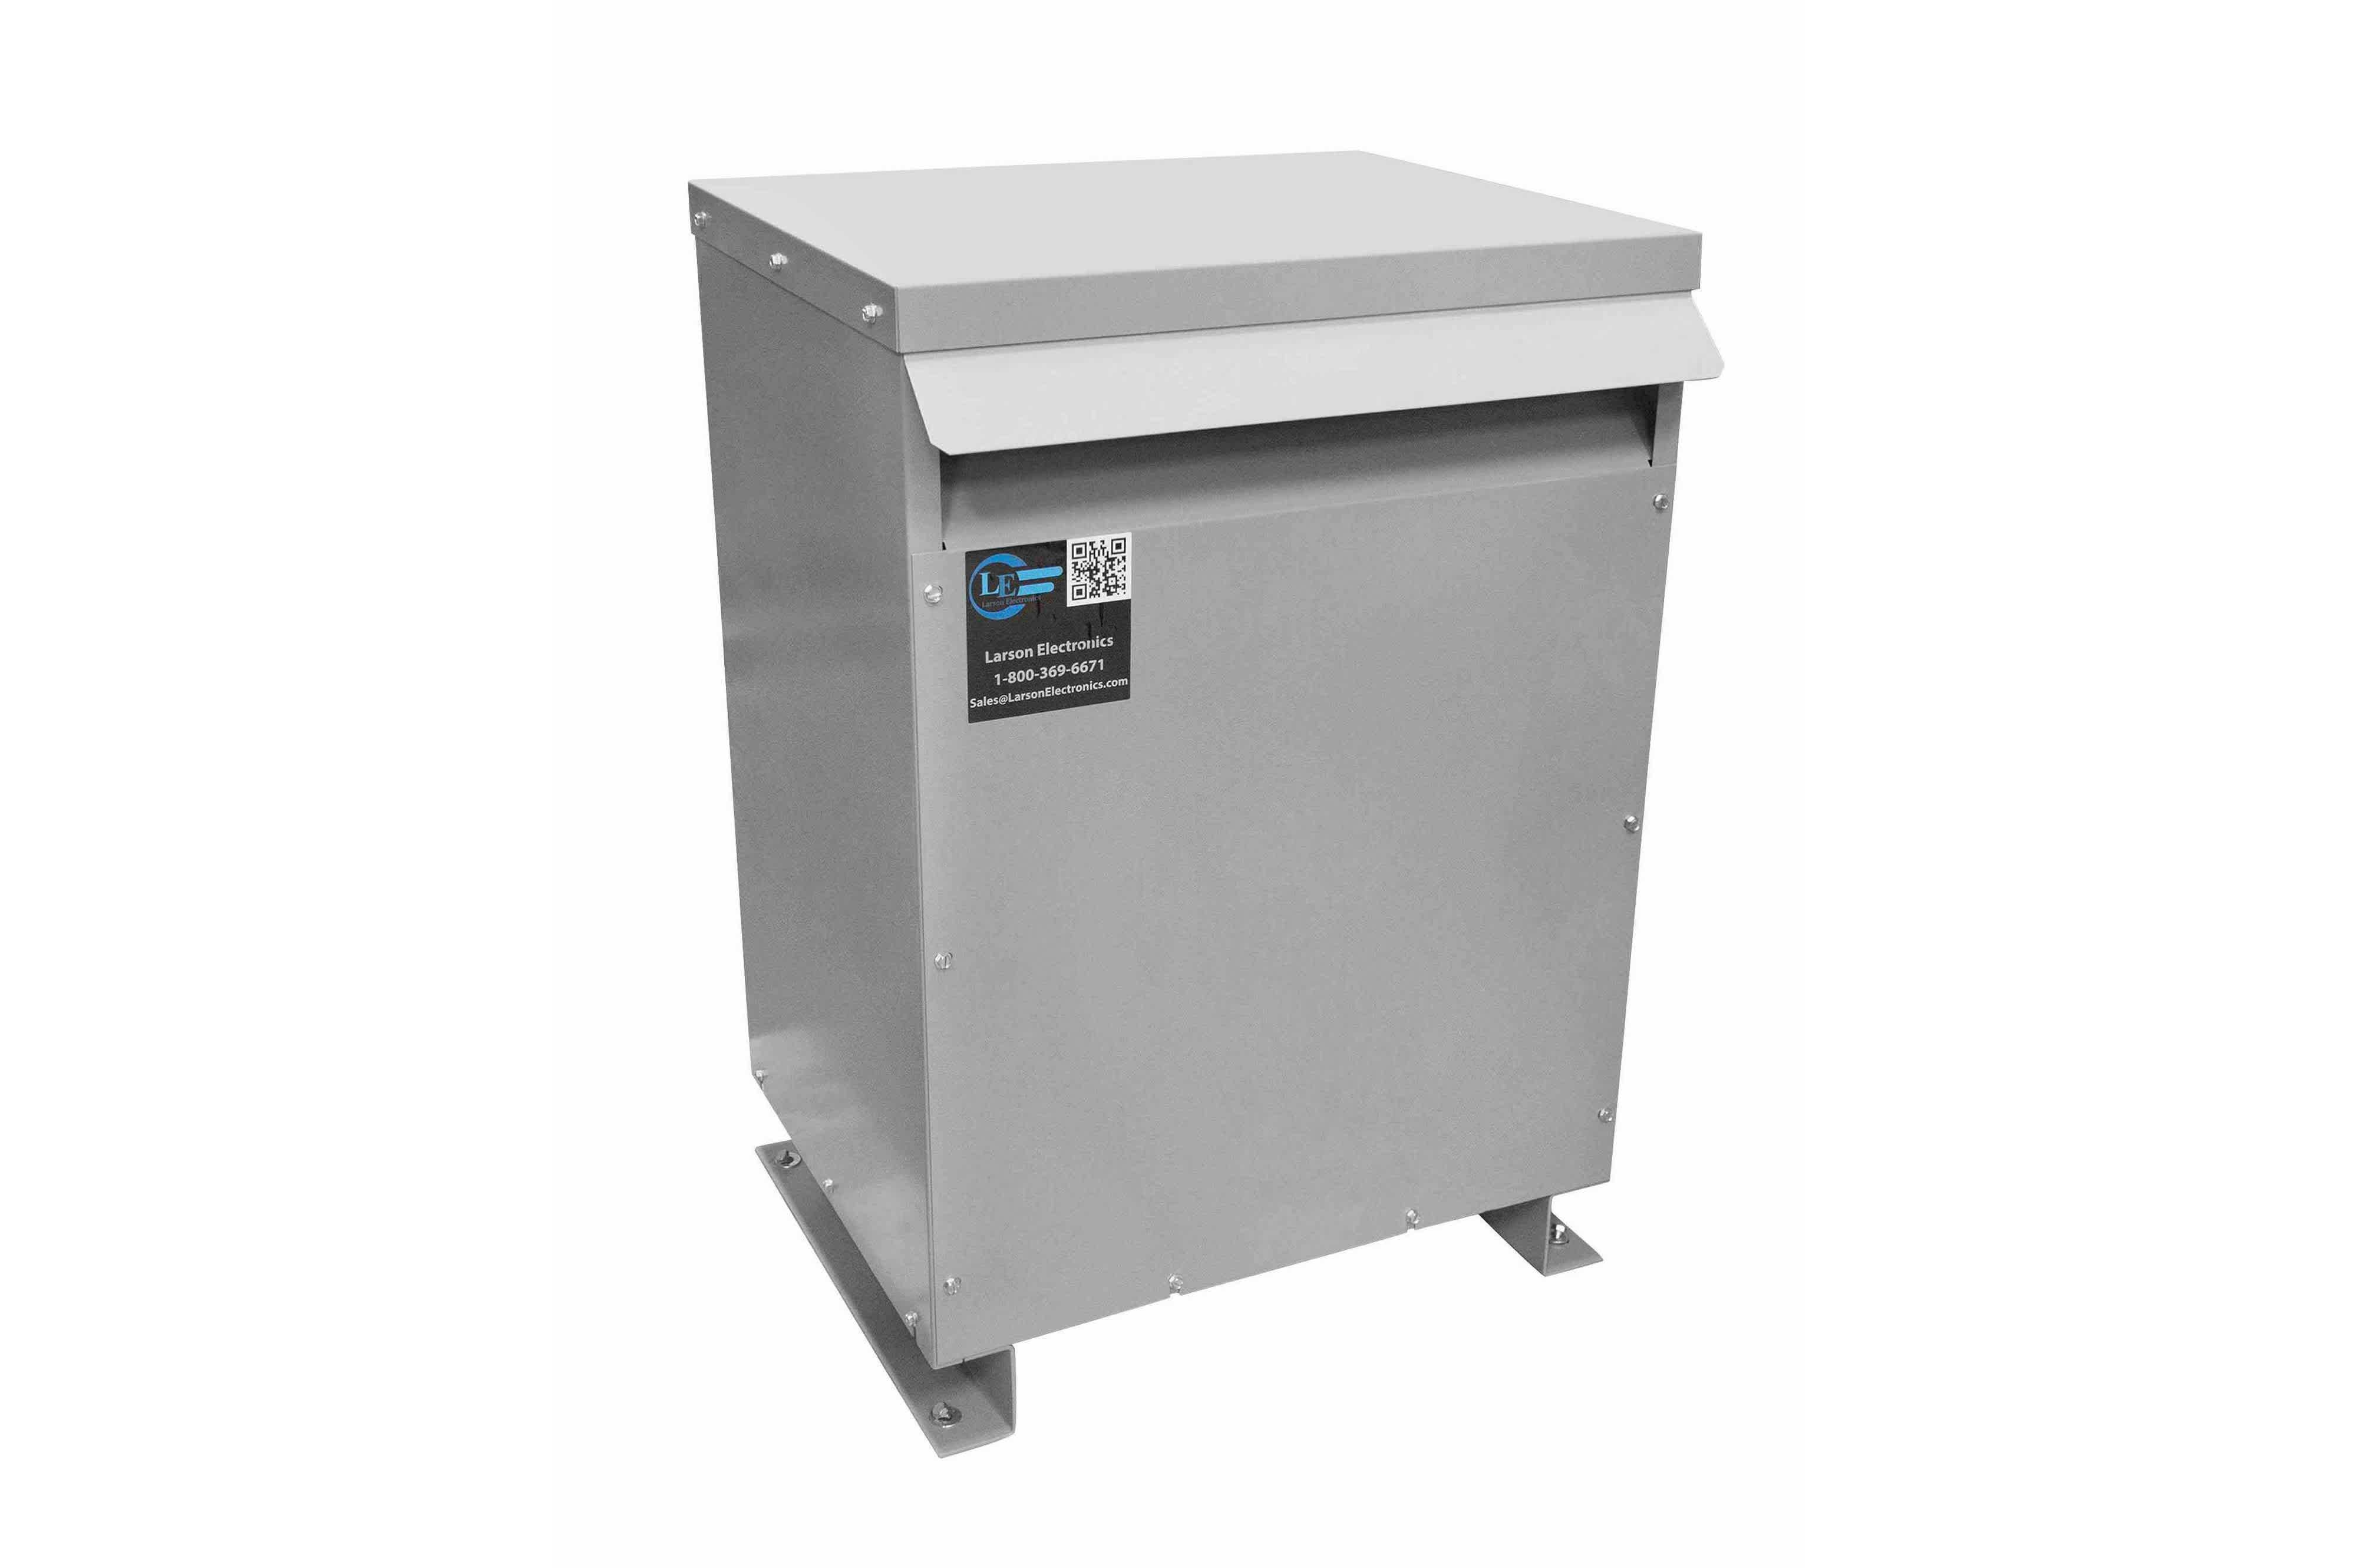 50 kVA 3PH DOE Transformer, 208V Delta Primary, 380Y/220 Wye-N Secondary, N3R, Ventilated, 60 Hz